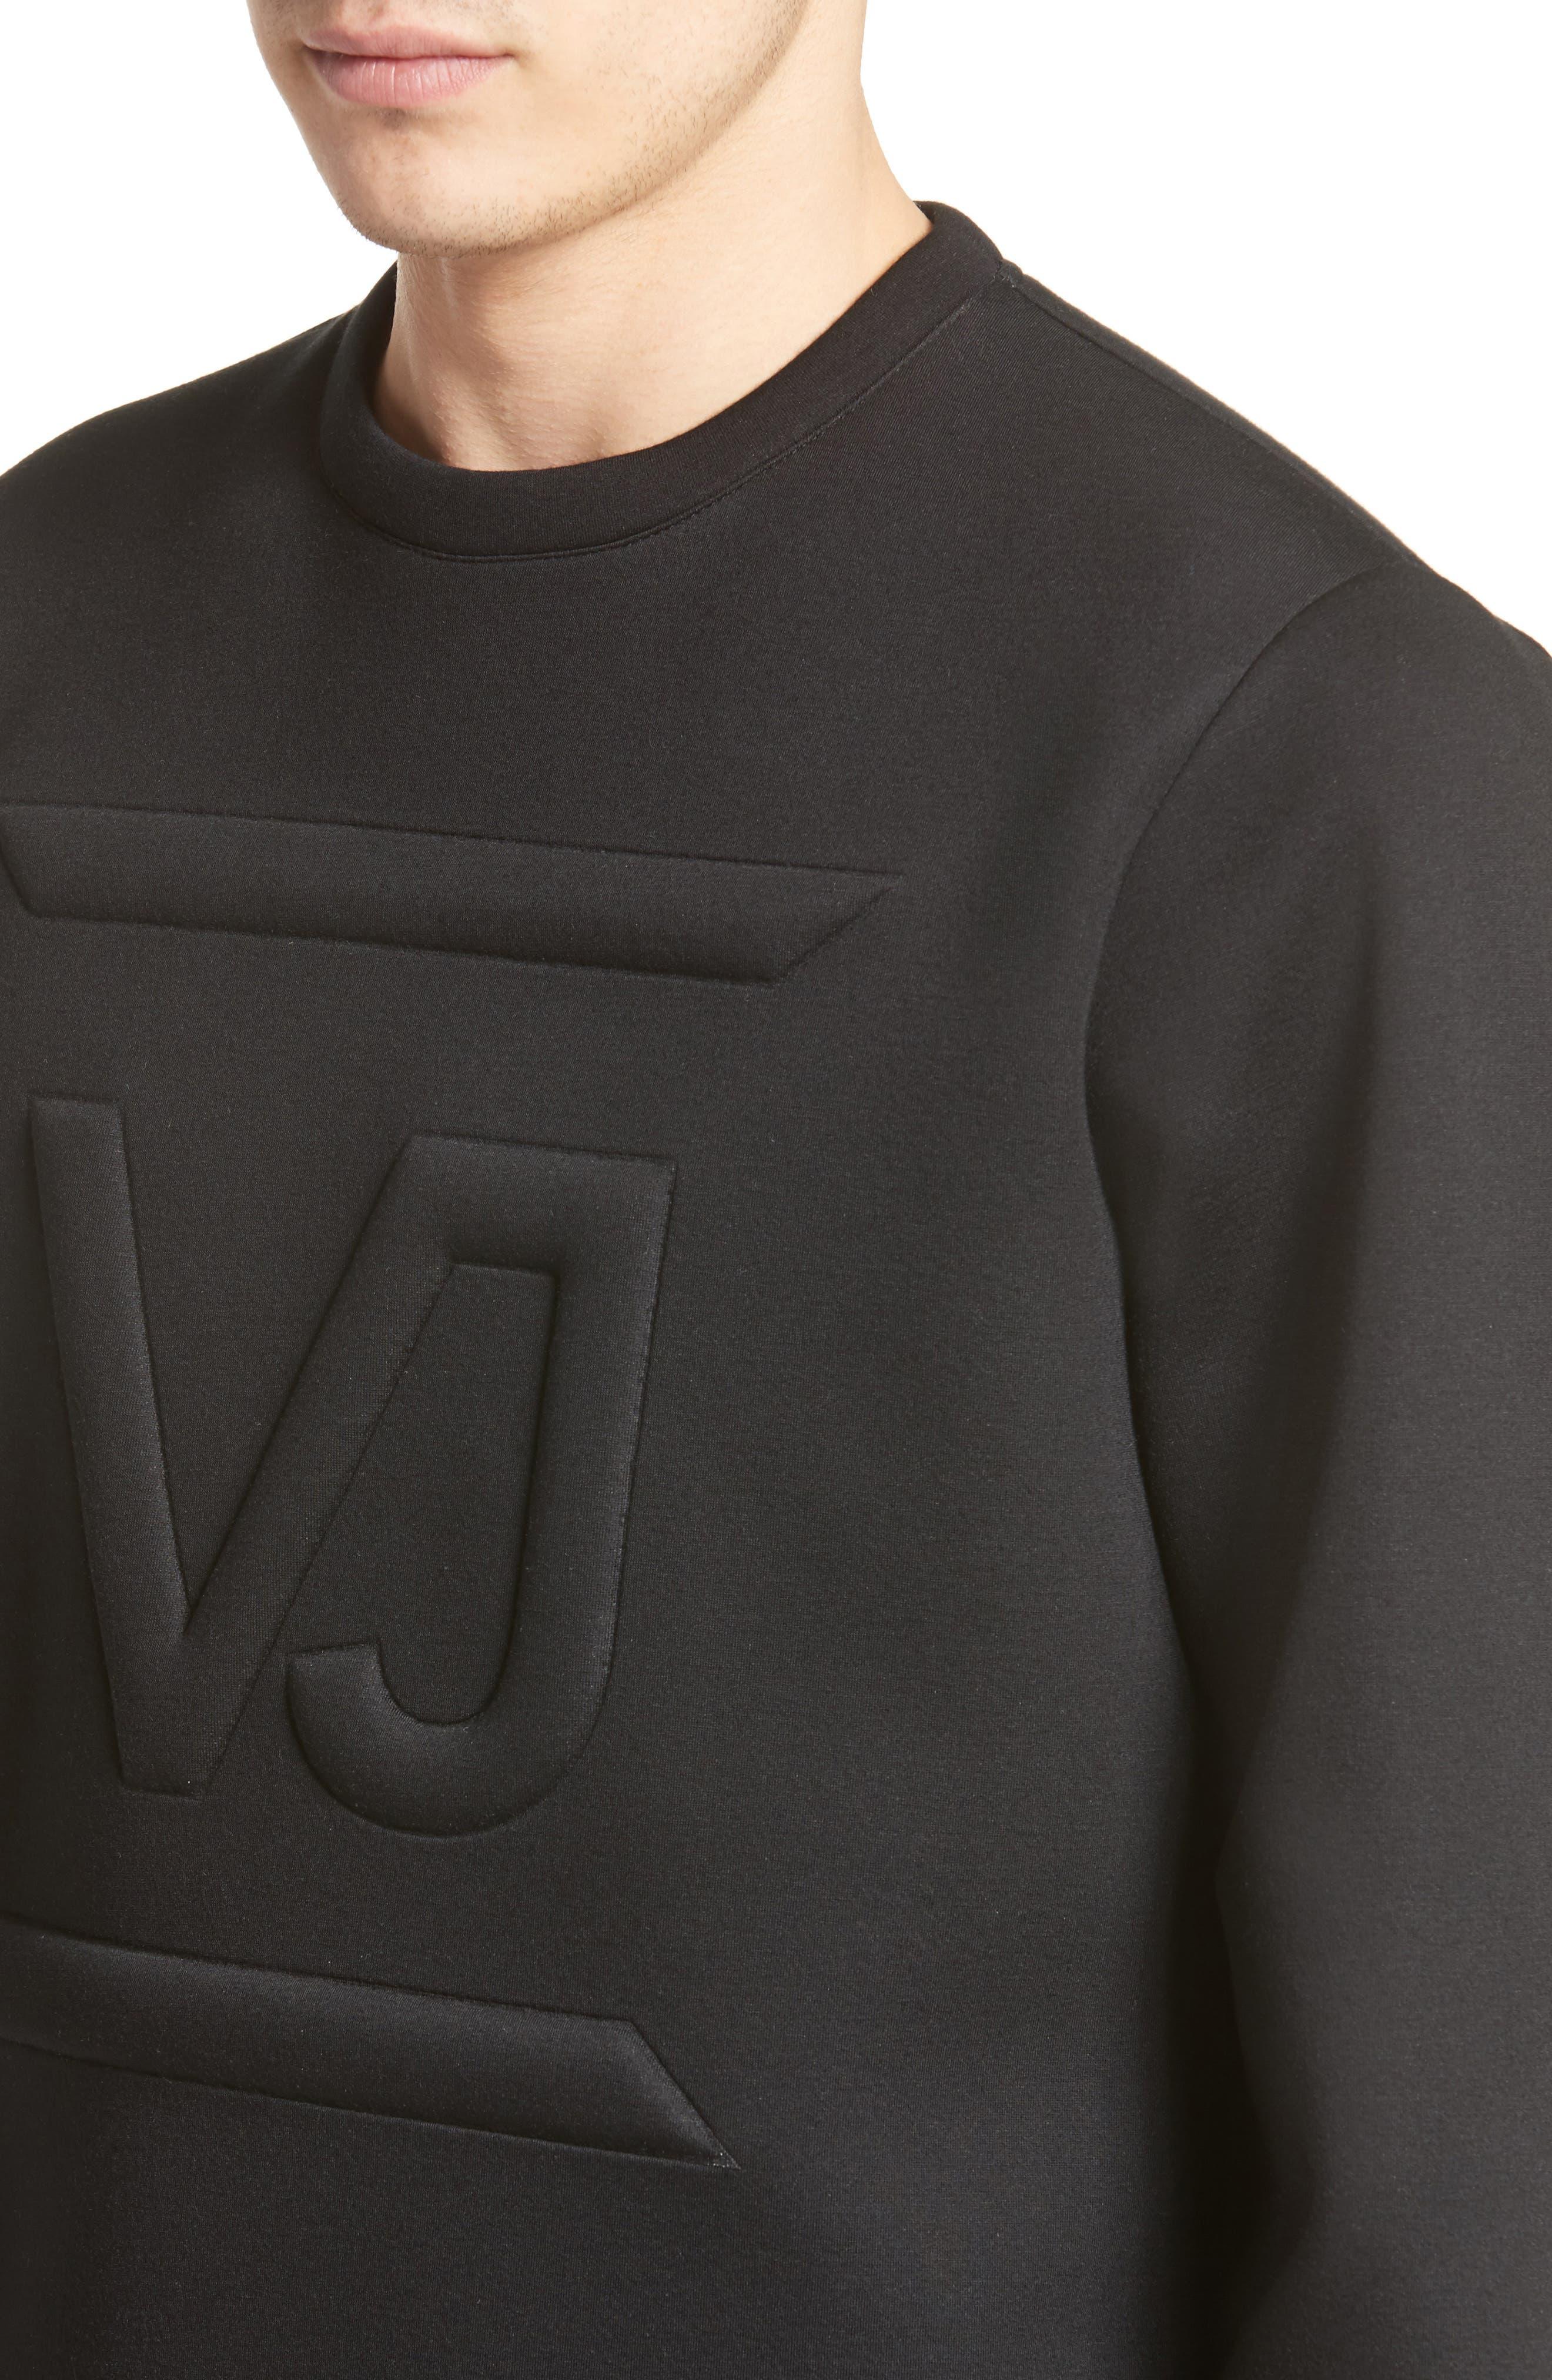 Large Logo Sweatshirt,                             Alternate thumbnail 4, color,                             001